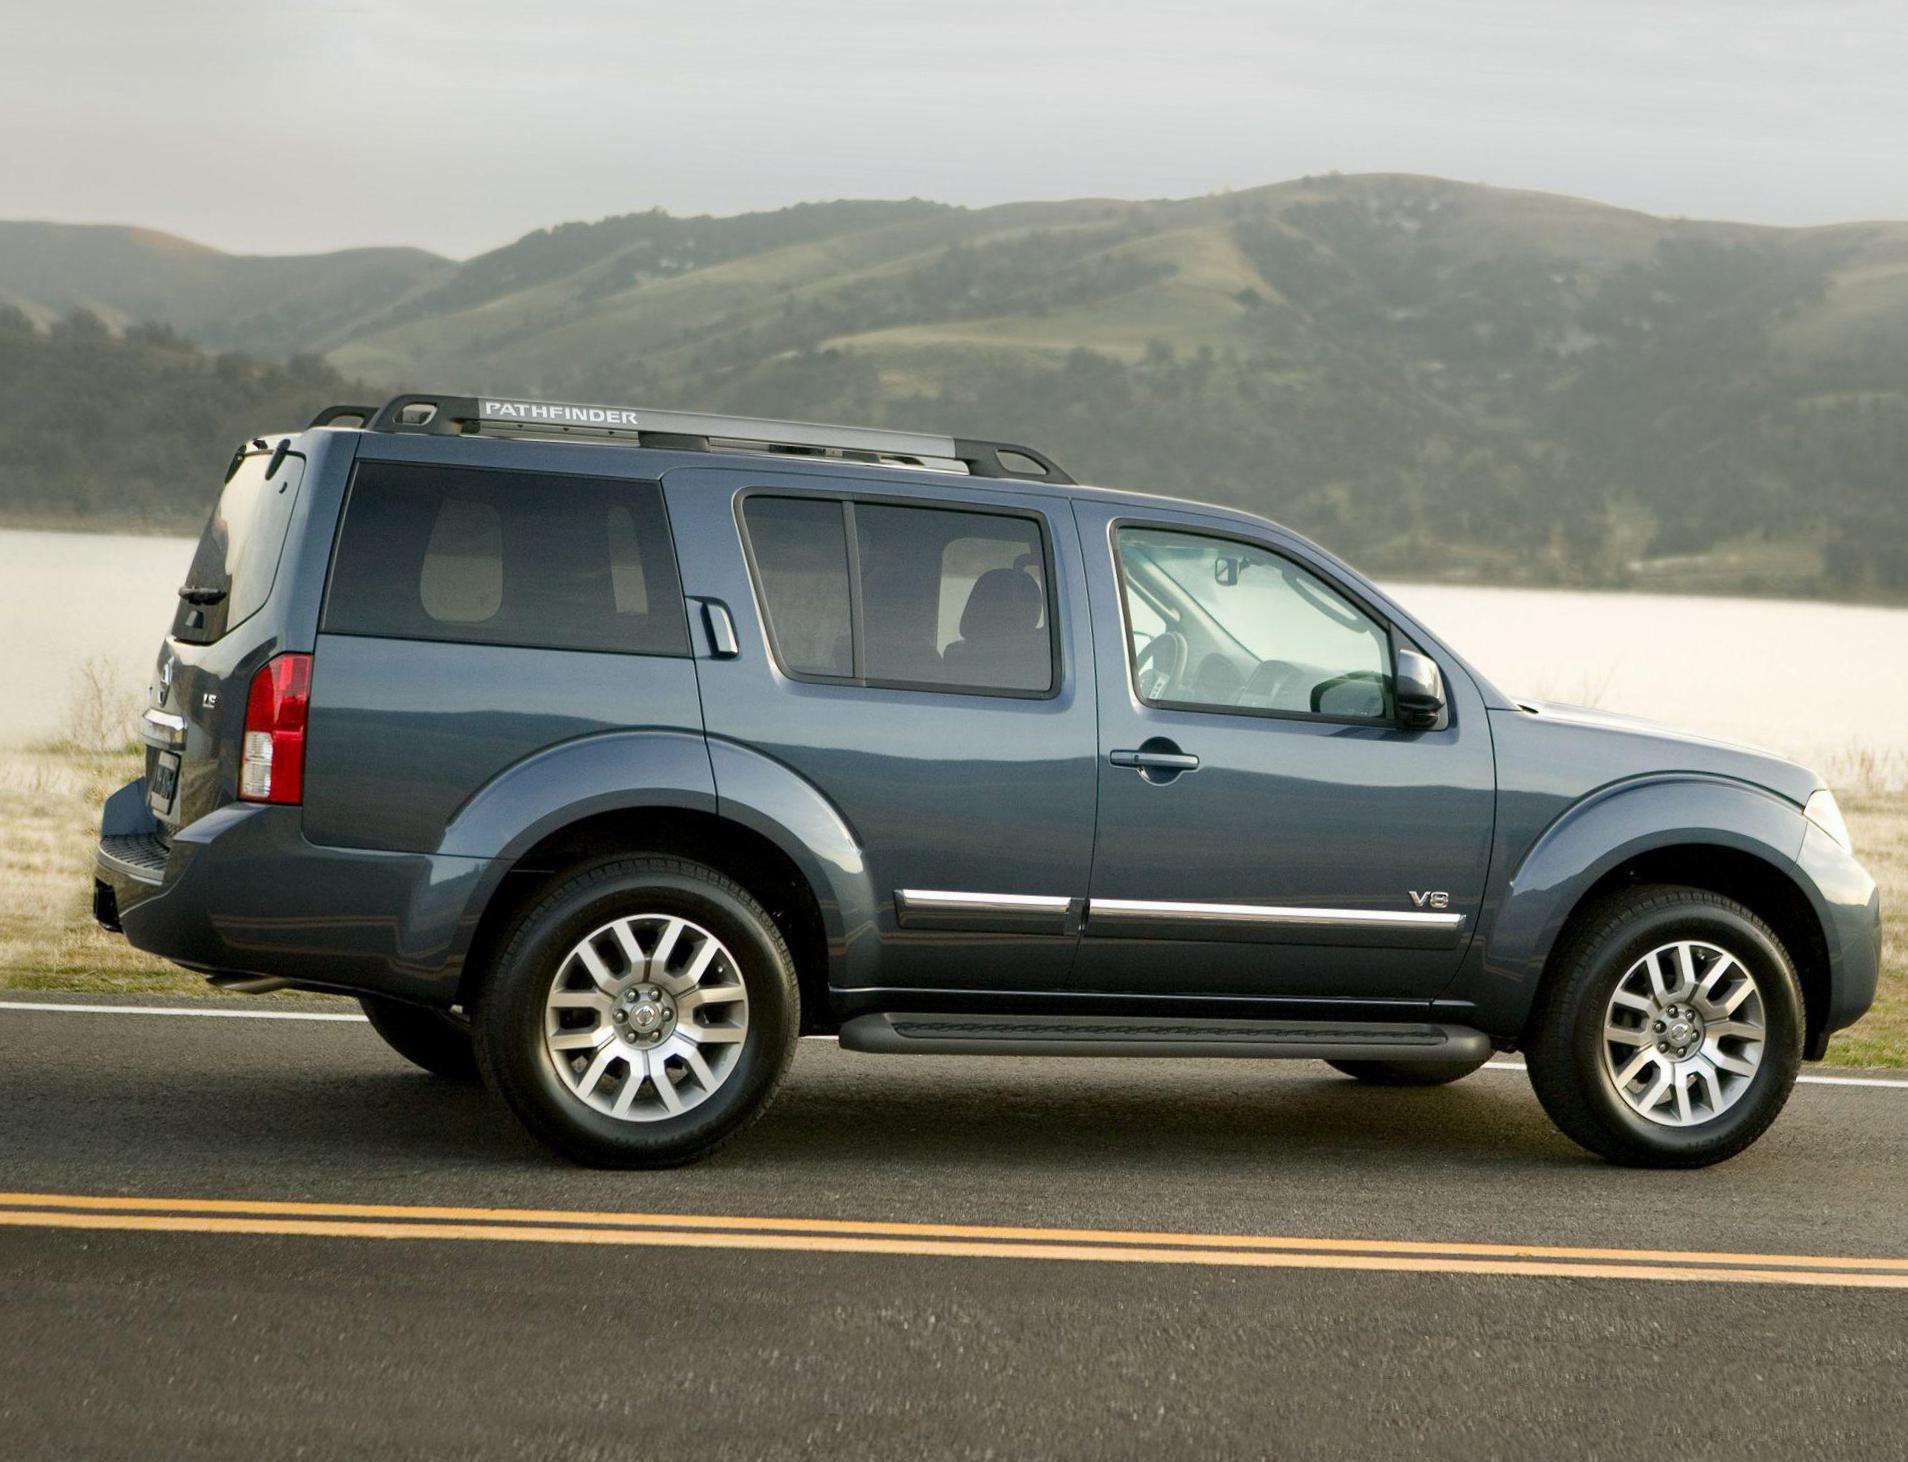 Nissan Pathfinder tuning - http://autotras.com | Auto | Pinterest ...